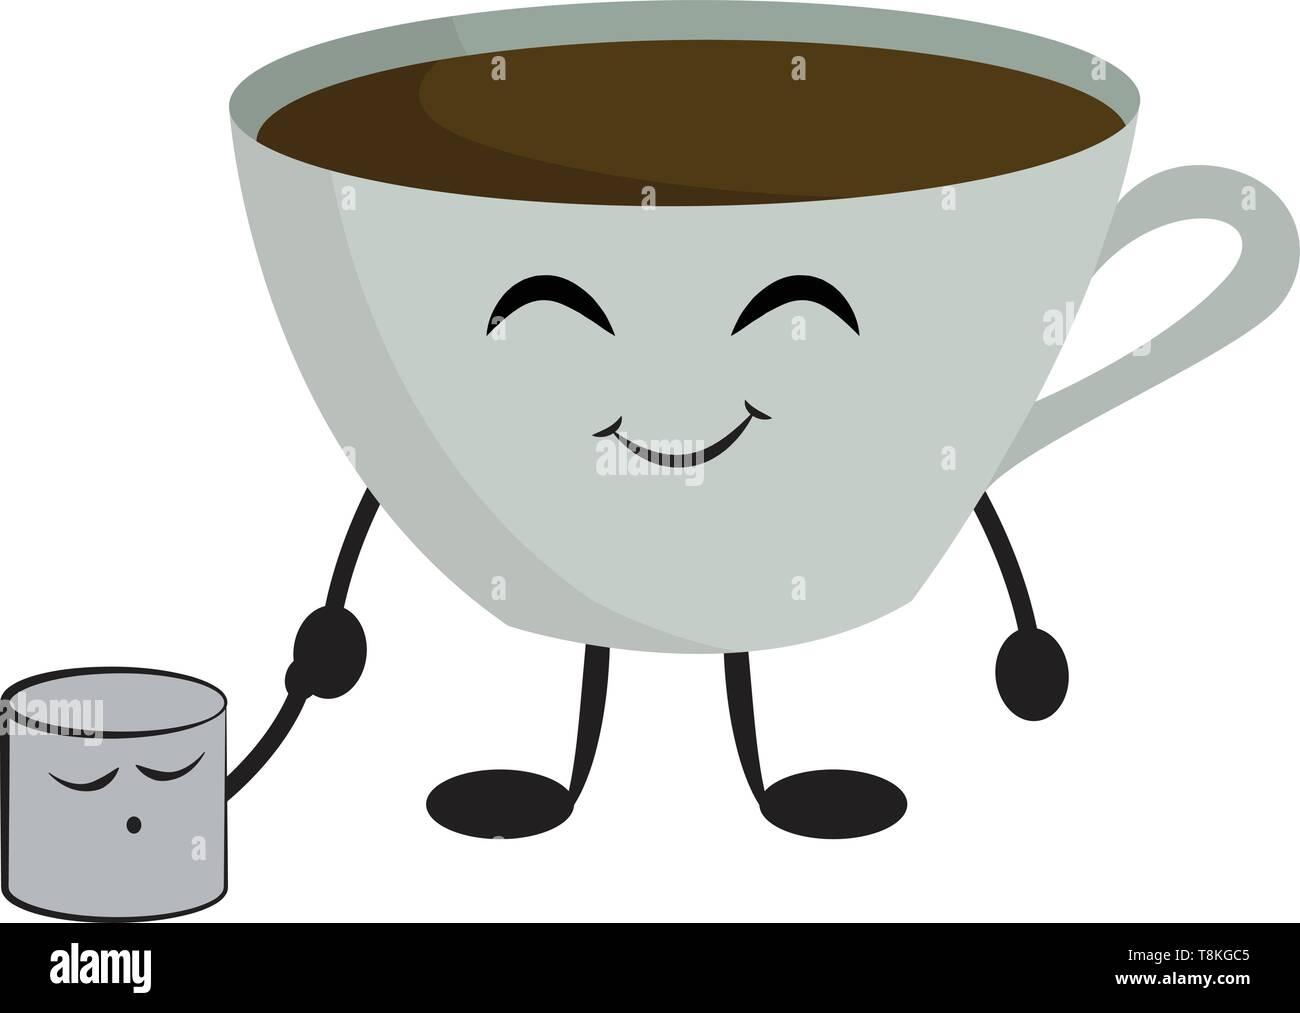 Café Hecho Con Marshmallow Malvavisco Esponjoso Es Un Dulce